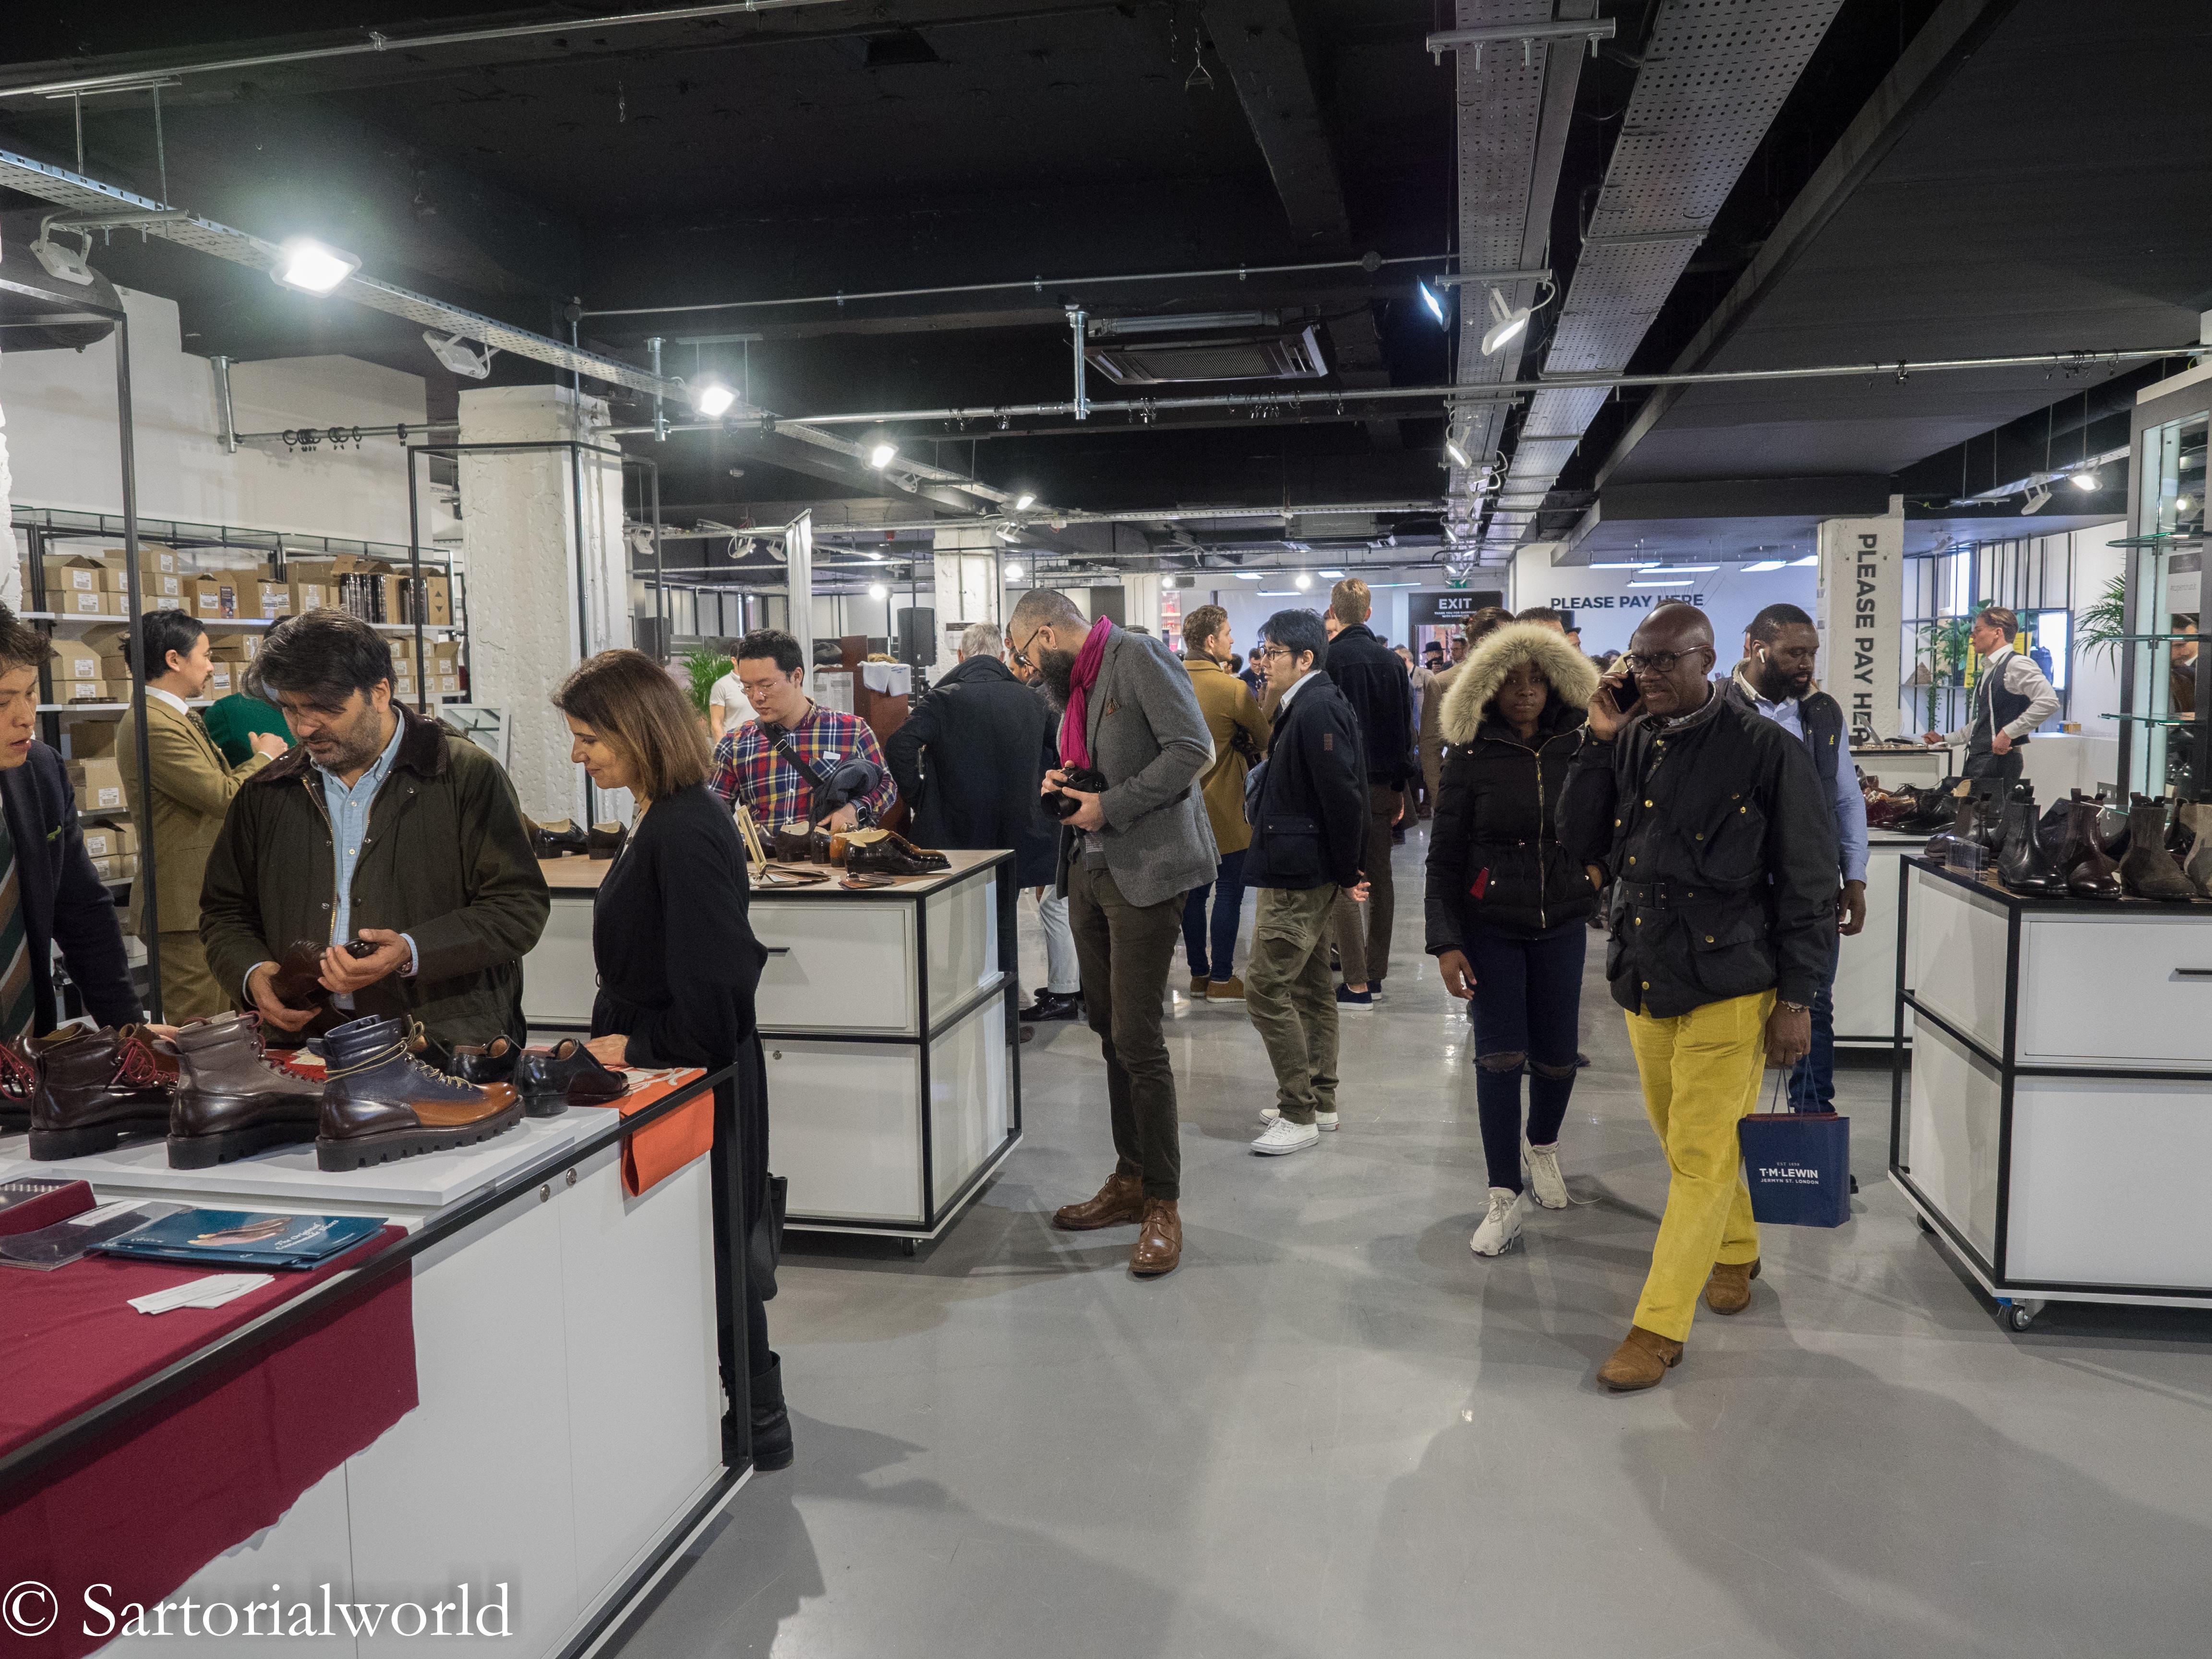 2019-03-23 London Super Trunk Show-64.jpg